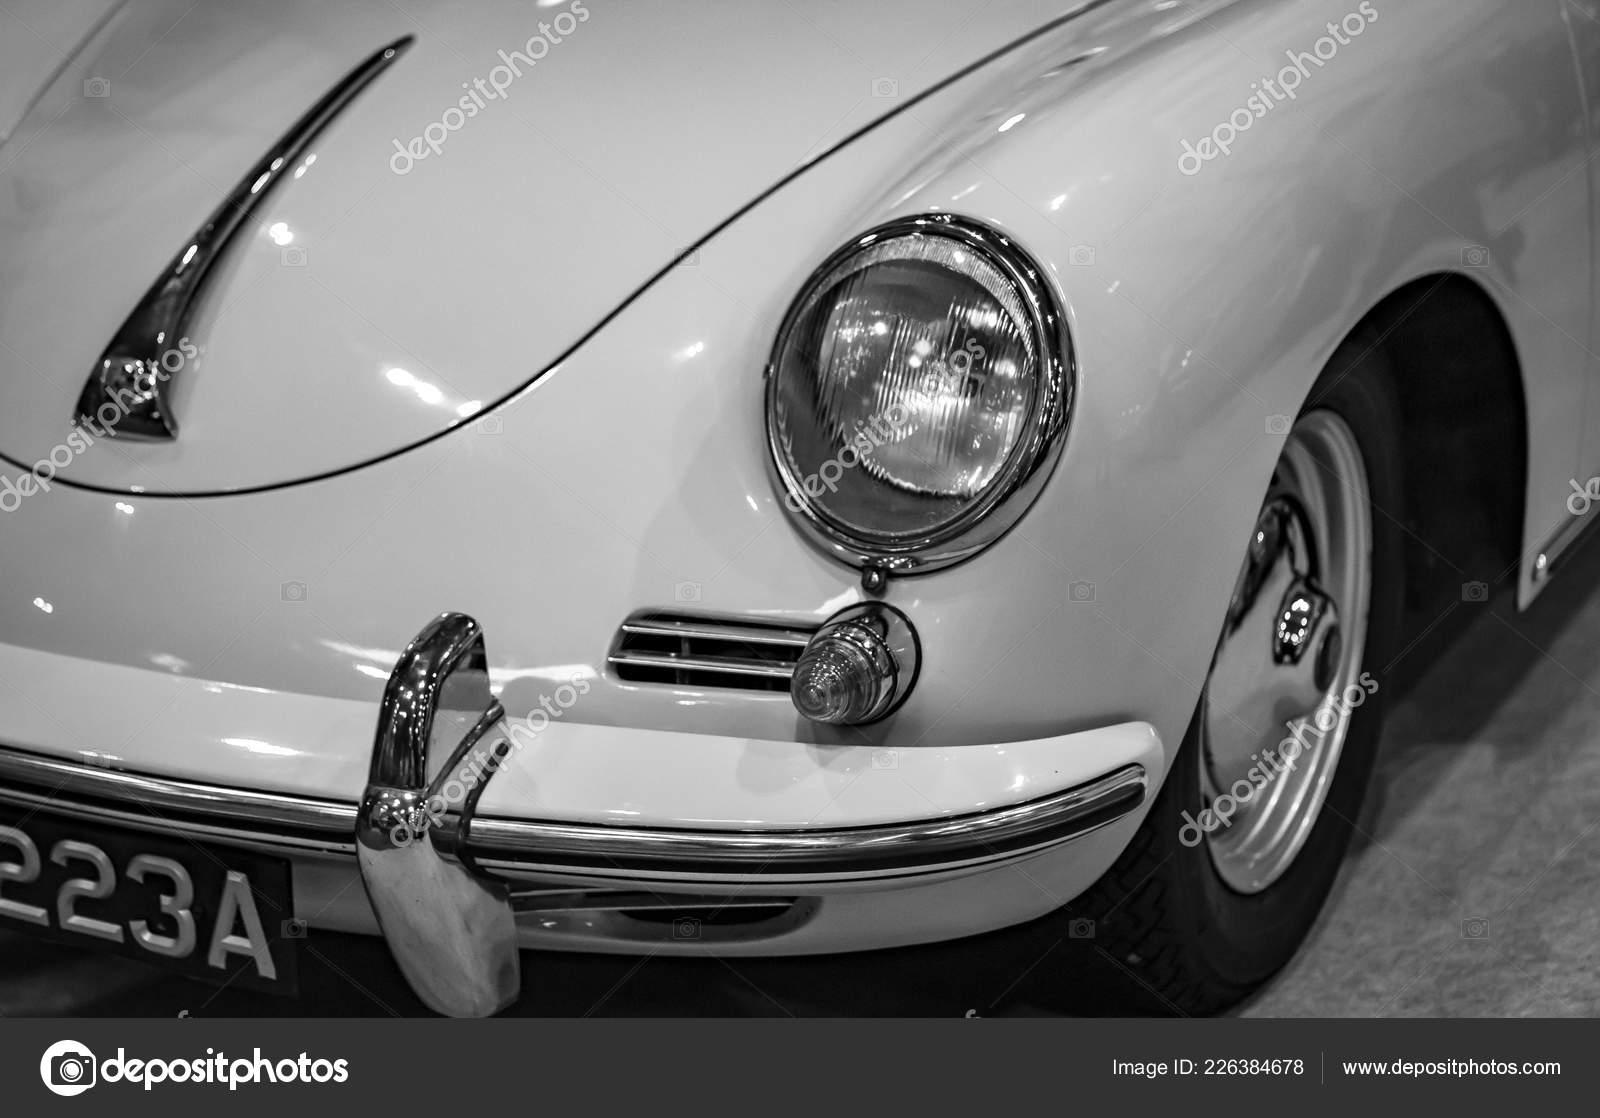 Farol Dianteiro Classico Carro Esportivo Porsche 356 Fotografia De Stock Editorial C Tobyparsons 226384678